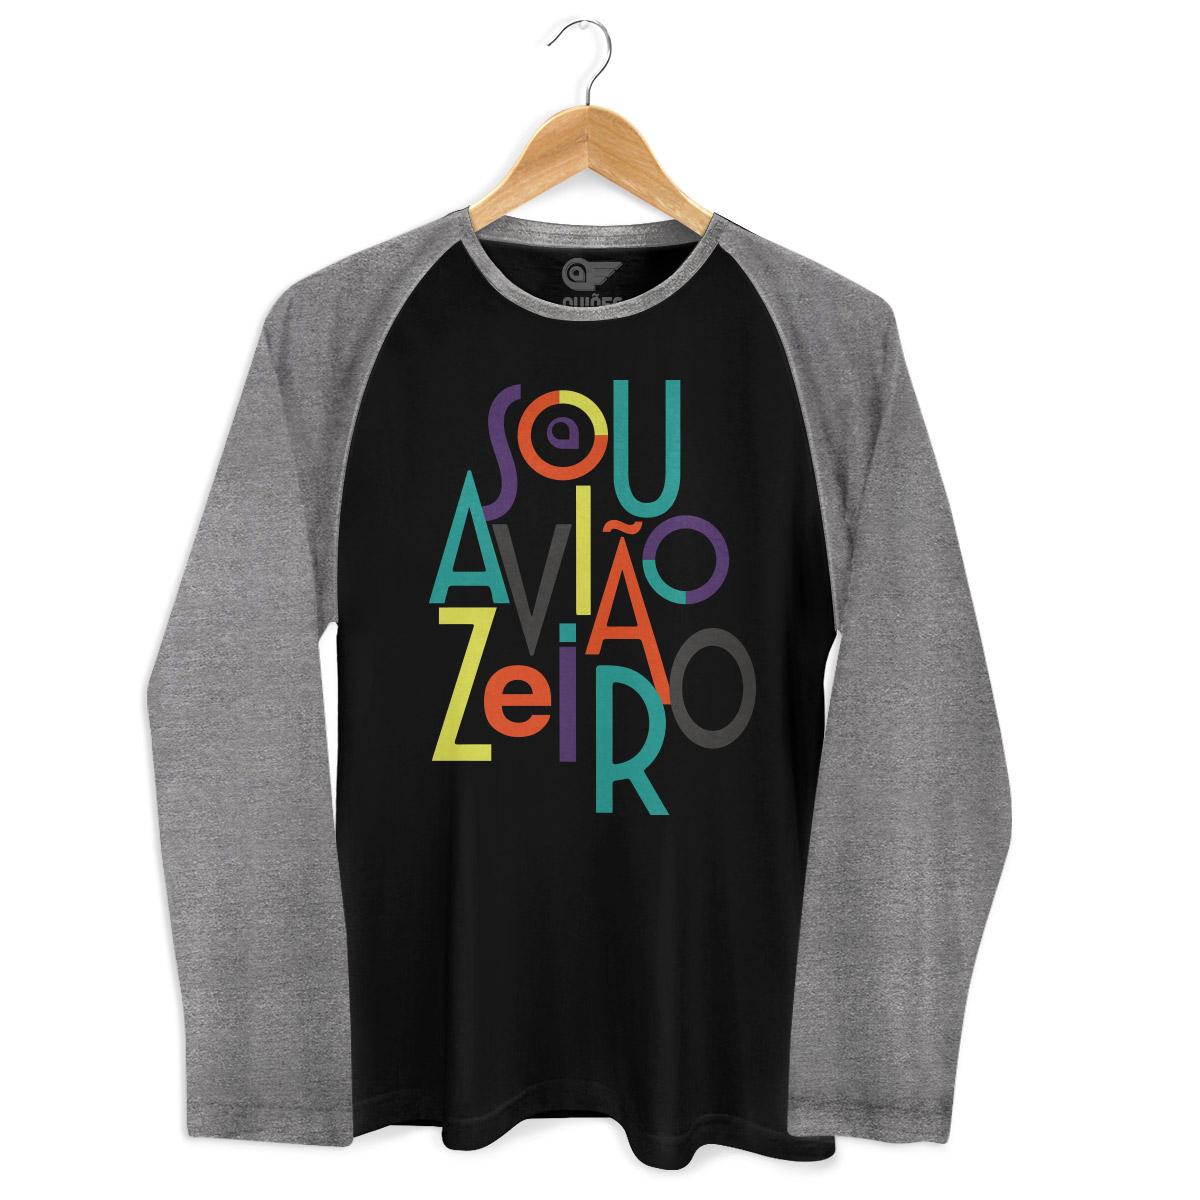 Camiseta Raglan Masculina Aviões do Forró Sou Aviãozeiro